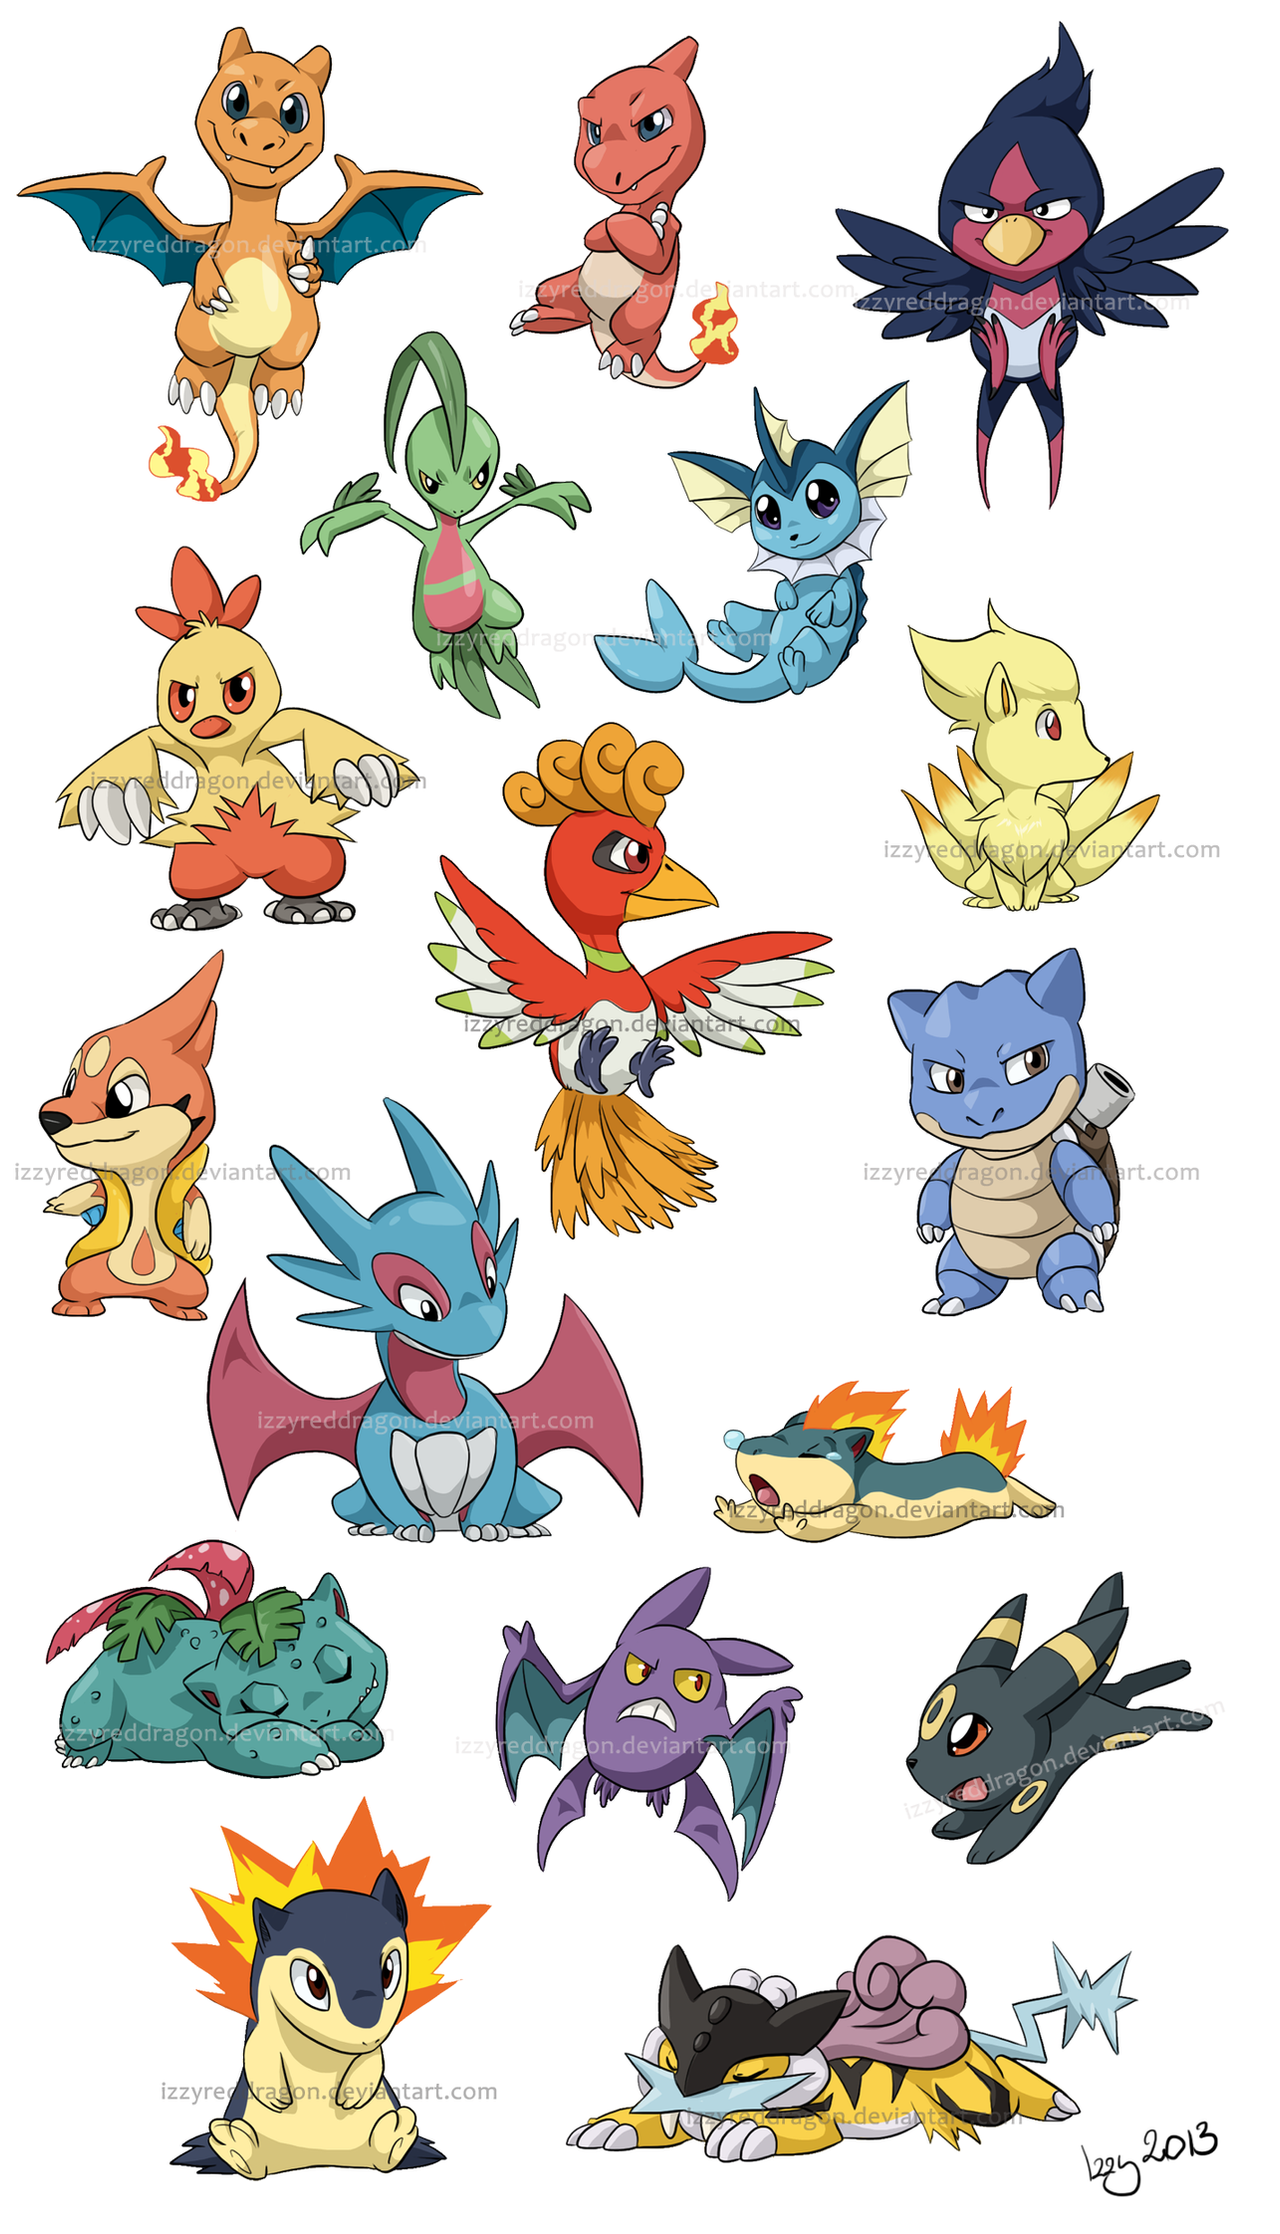 Chibi Pokemon Stuff By Natsuakai On Deviantart